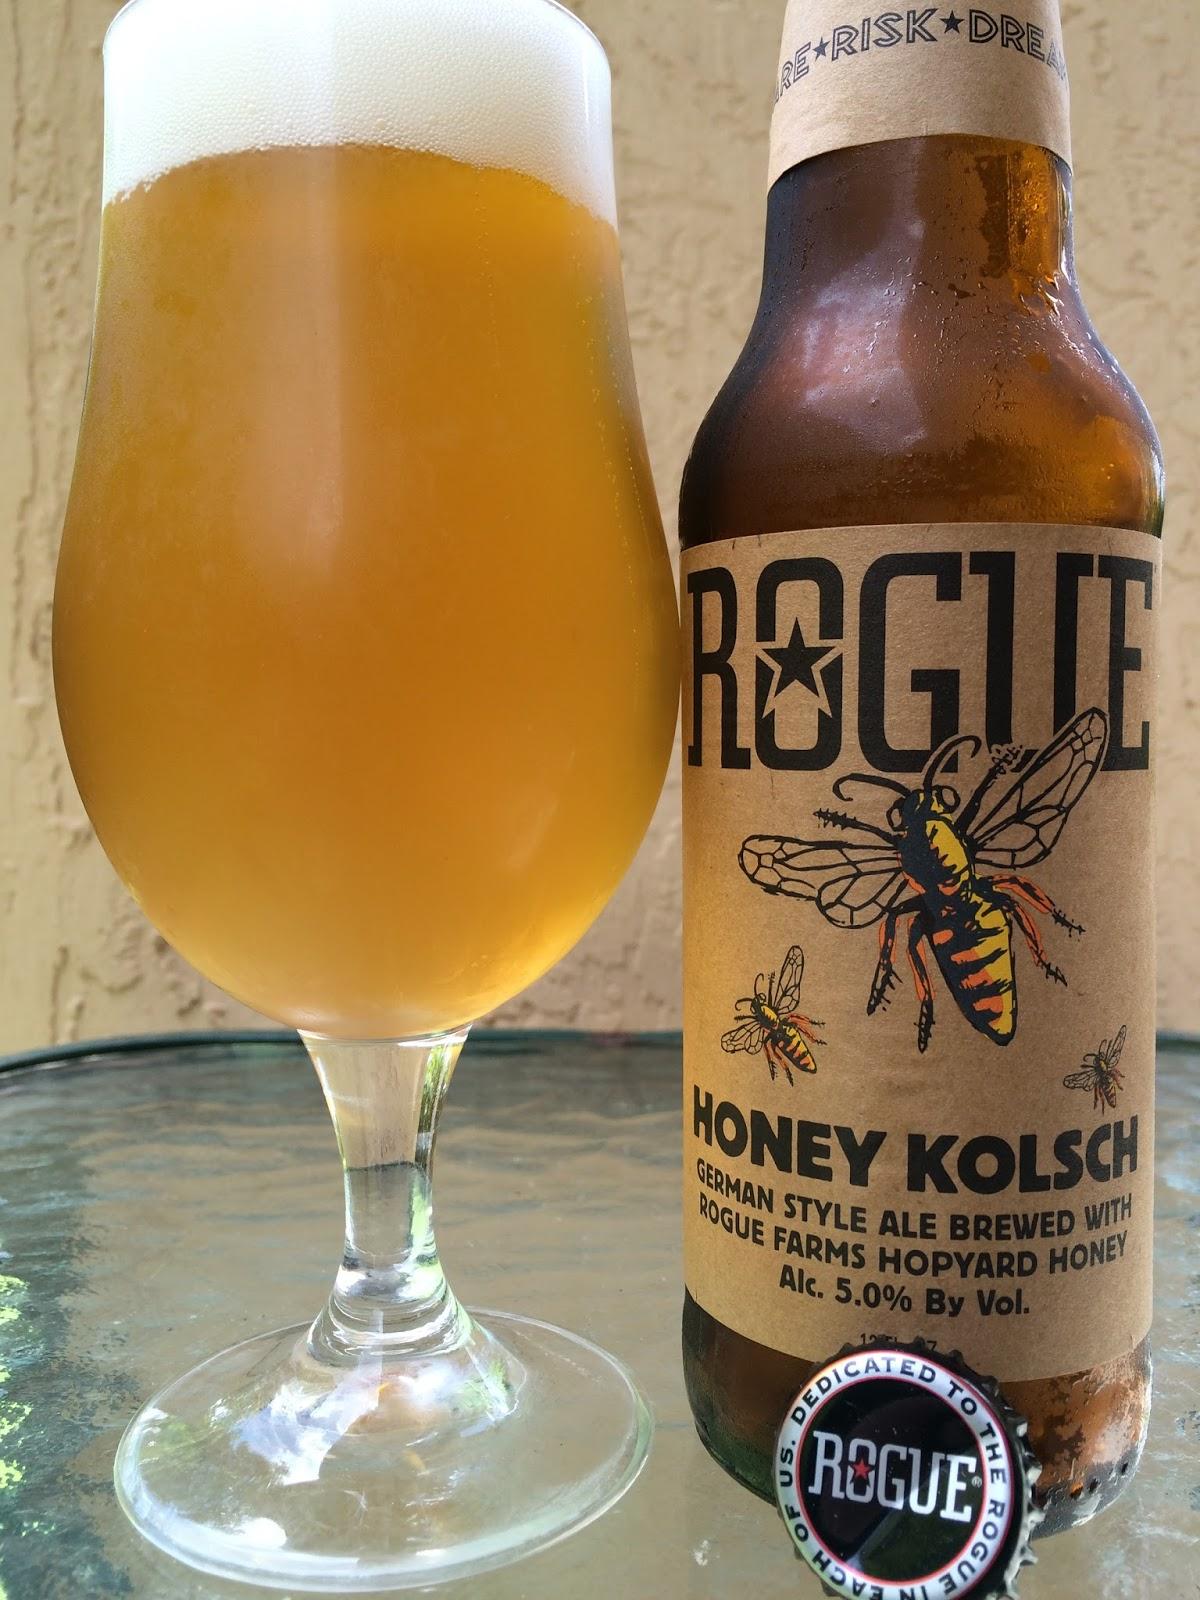 Daily Beer Review Rogue Honey Kolsch